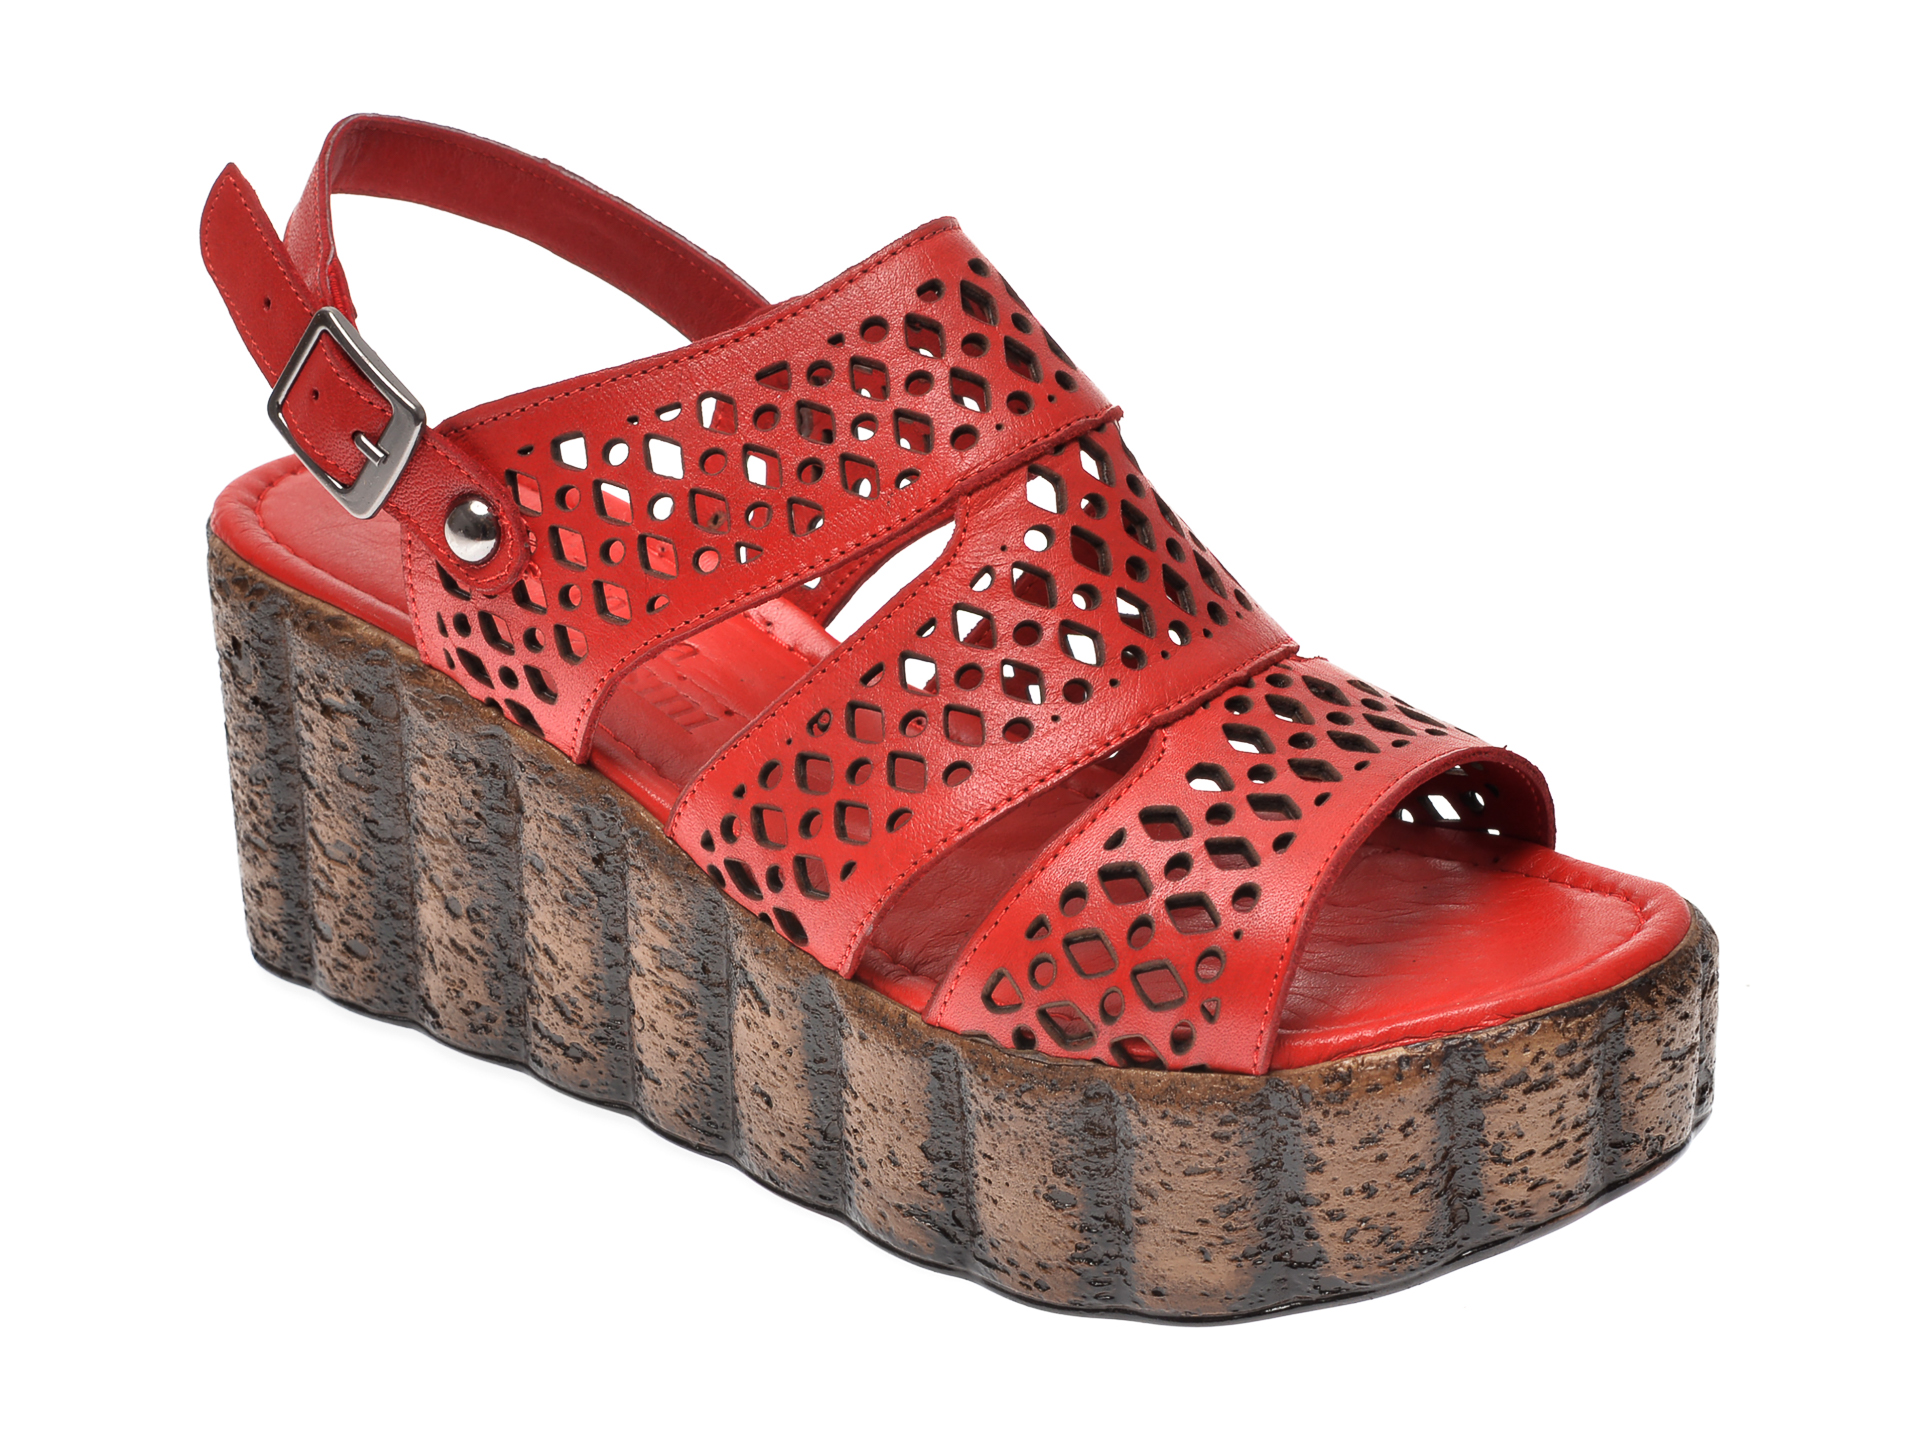 Sandale IMAGE rosii, 108, din piele naturala